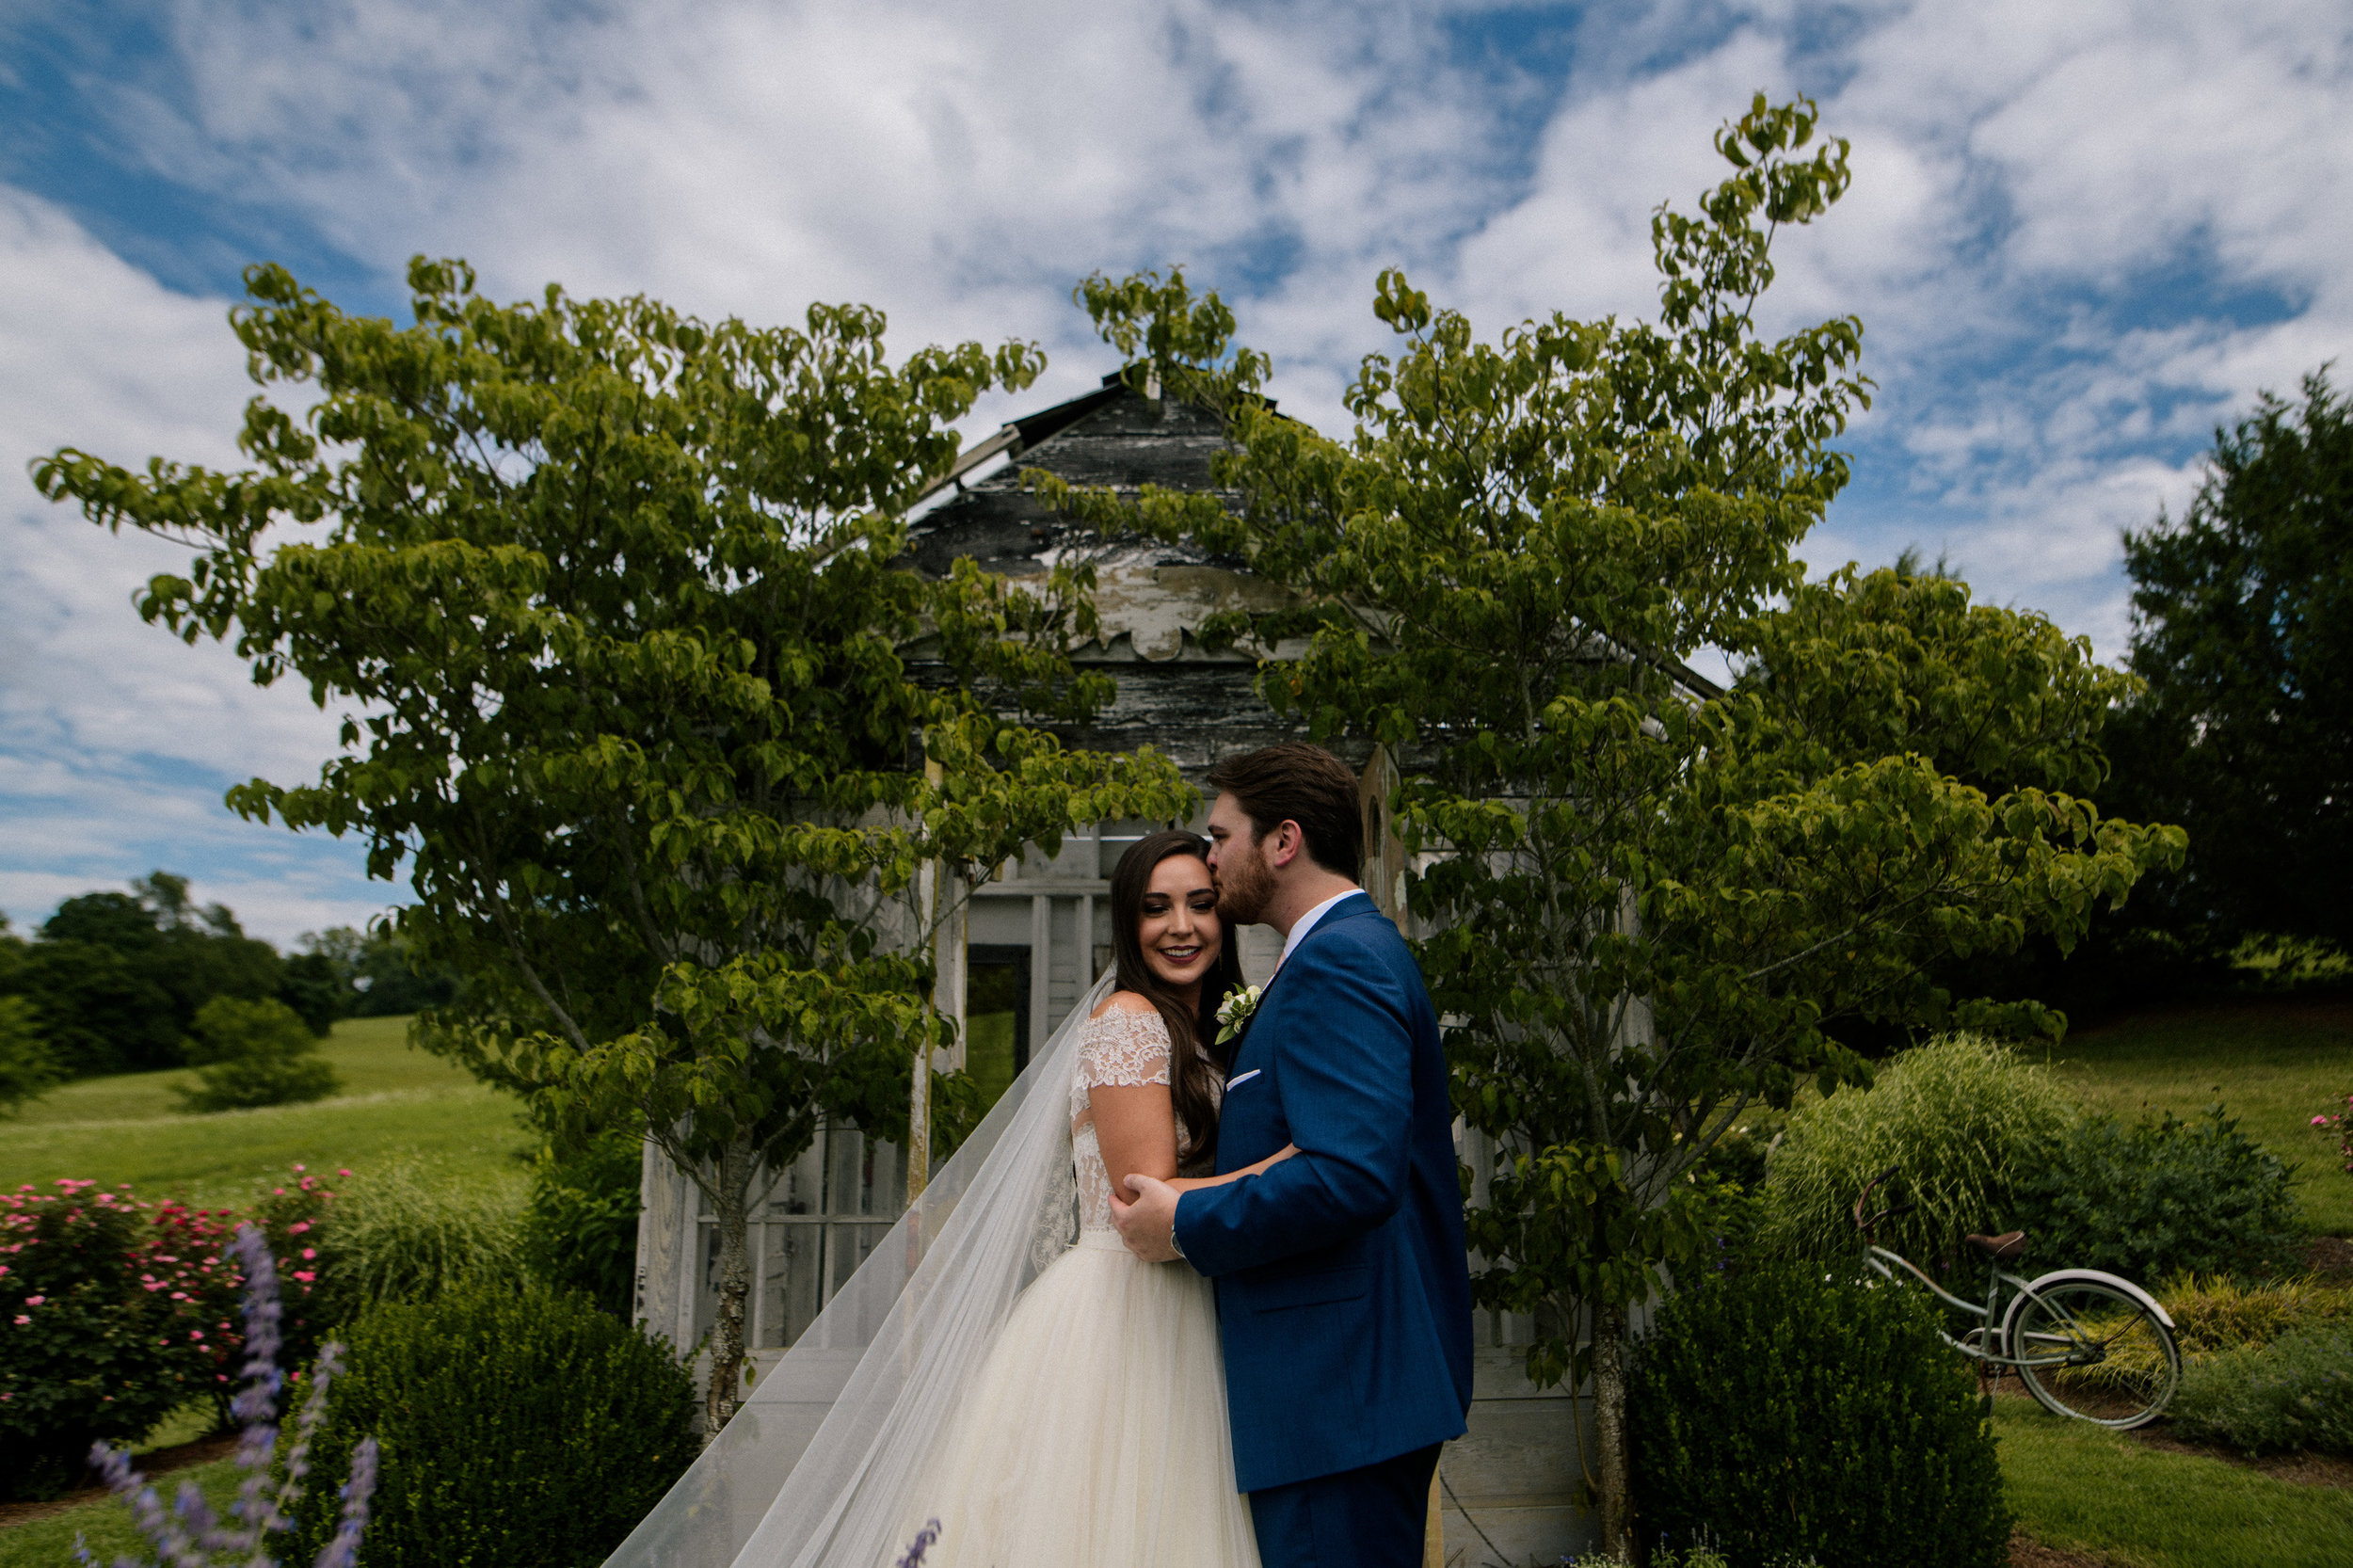 Nashville_Wedding_Photography_Mint_Springs_30.jpg